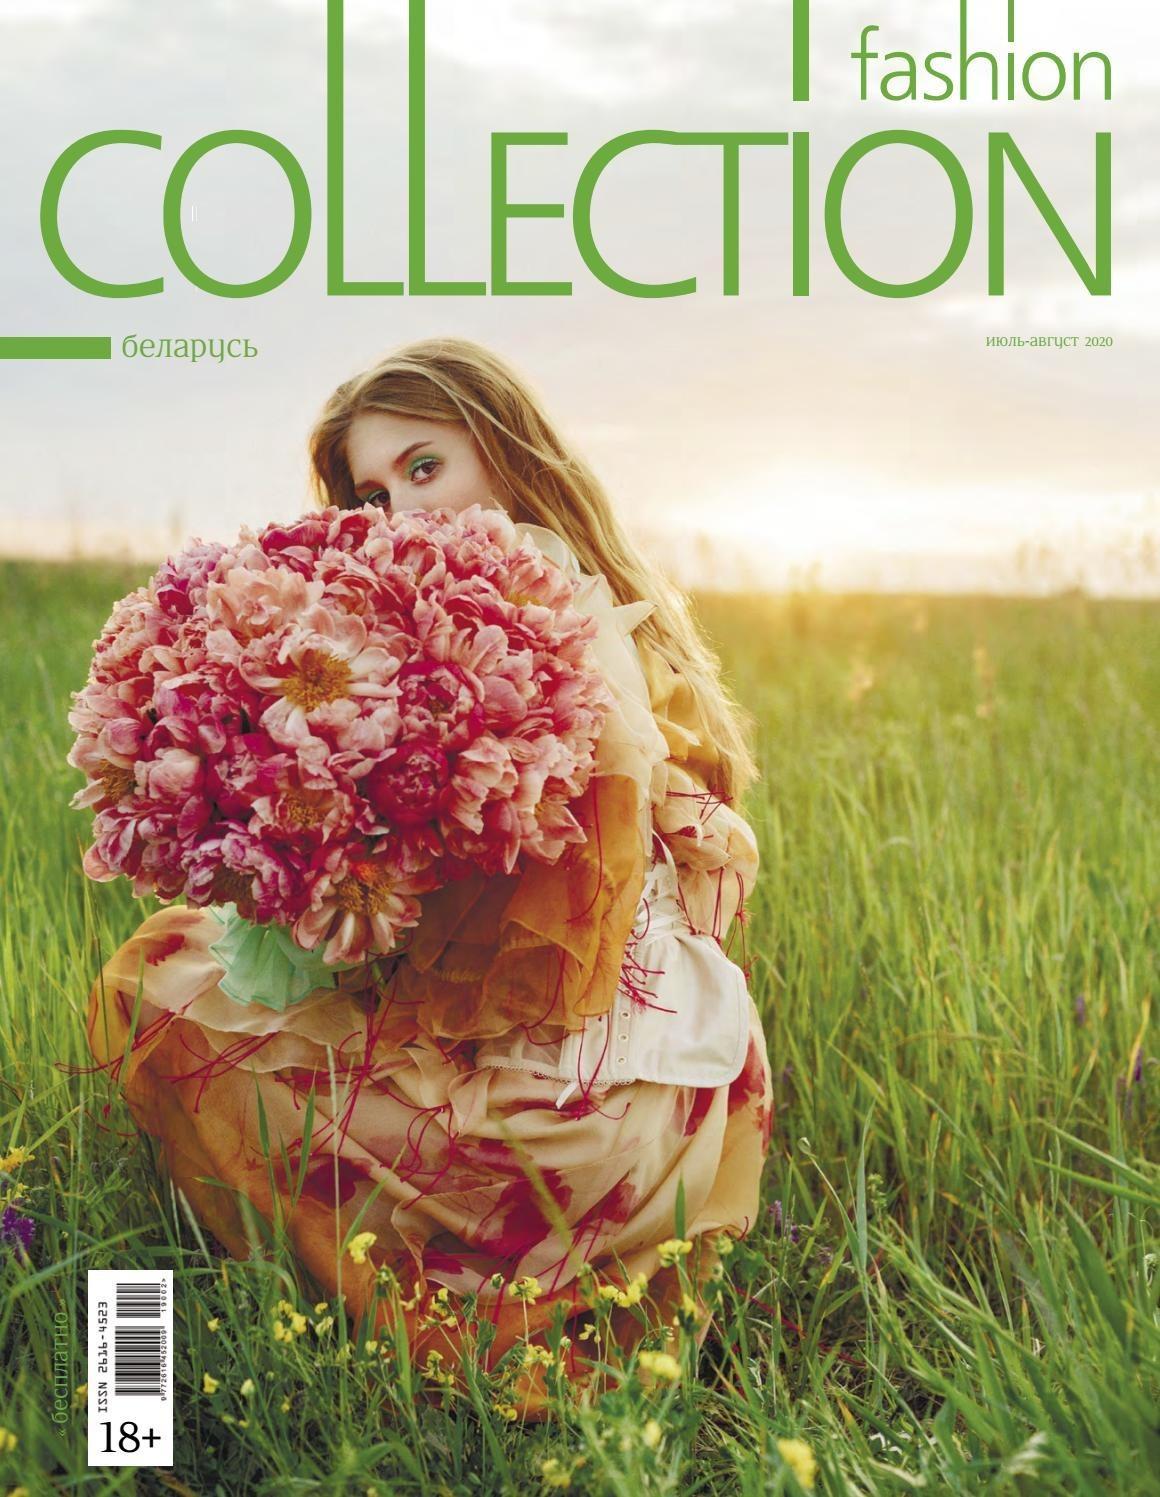 Fashion Collection. Беларусь №7-8, июль-август, 2020